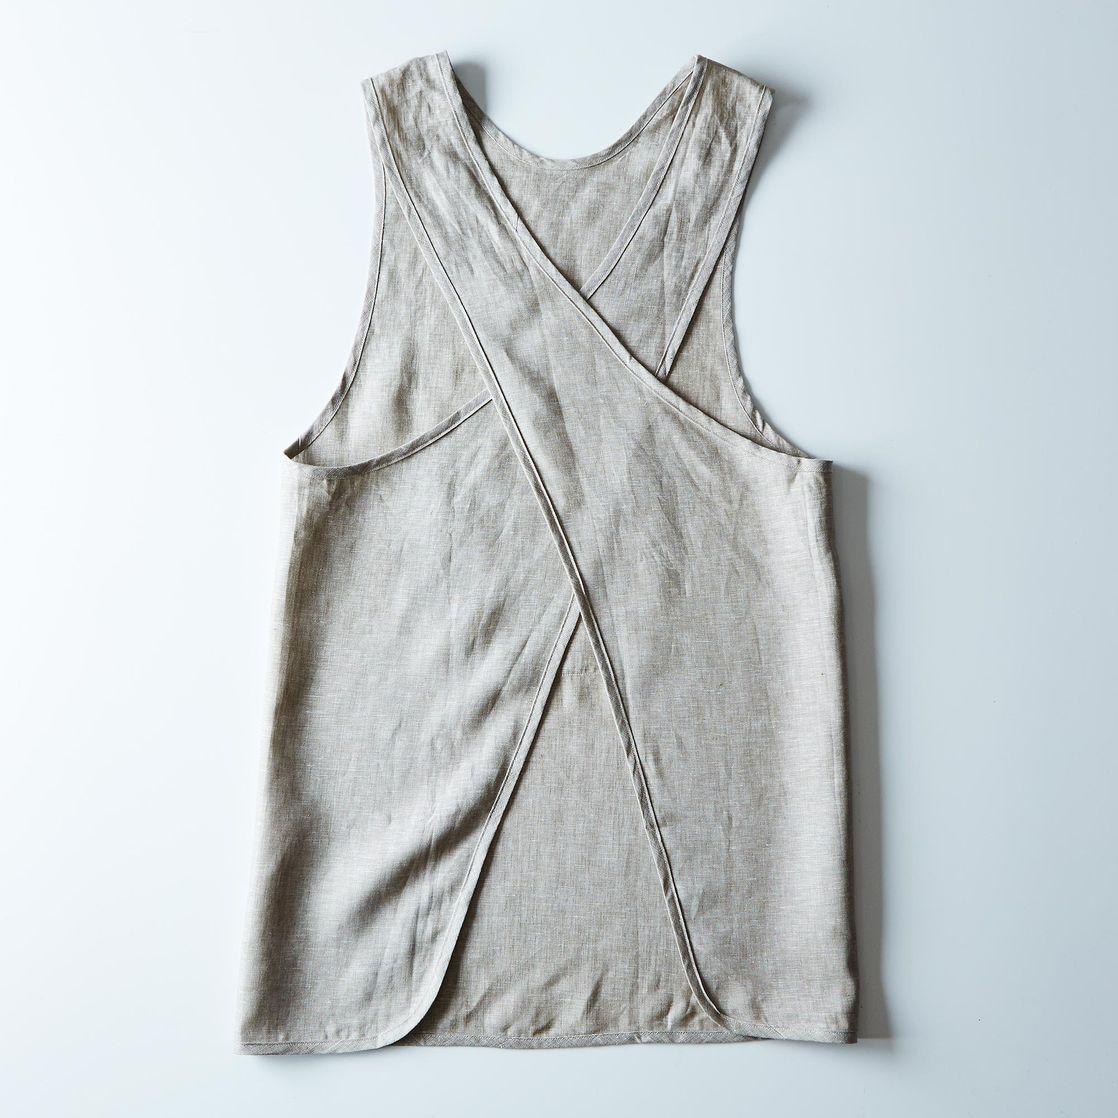 White linen apron - Cross Linen Apron